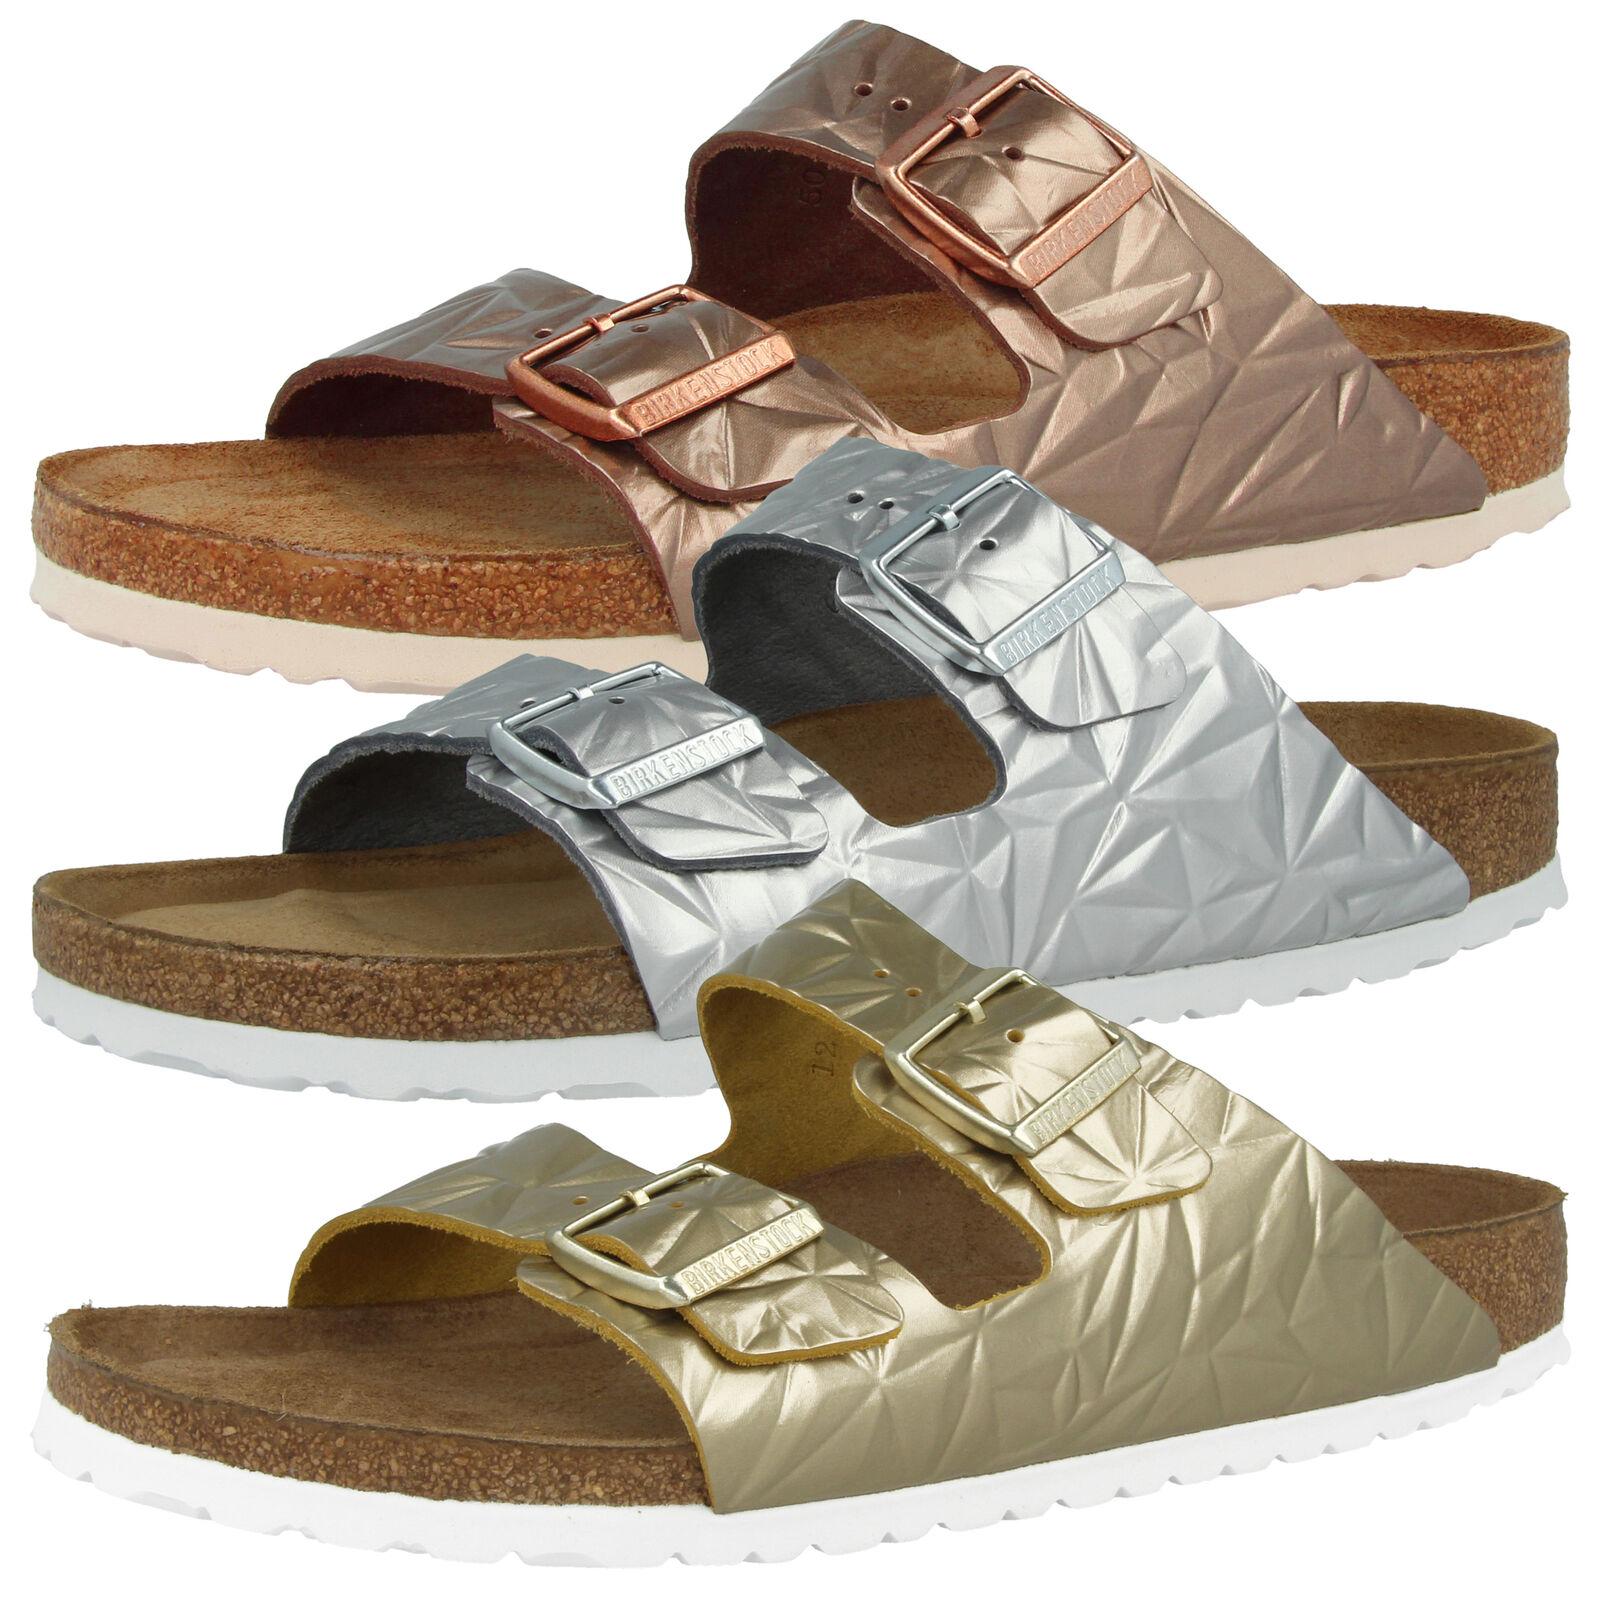 Birkenstock Arizona SFB pelle naturale sandali morbida zavorra Scarpe Spectral sandali naturale zoccoli d13a15